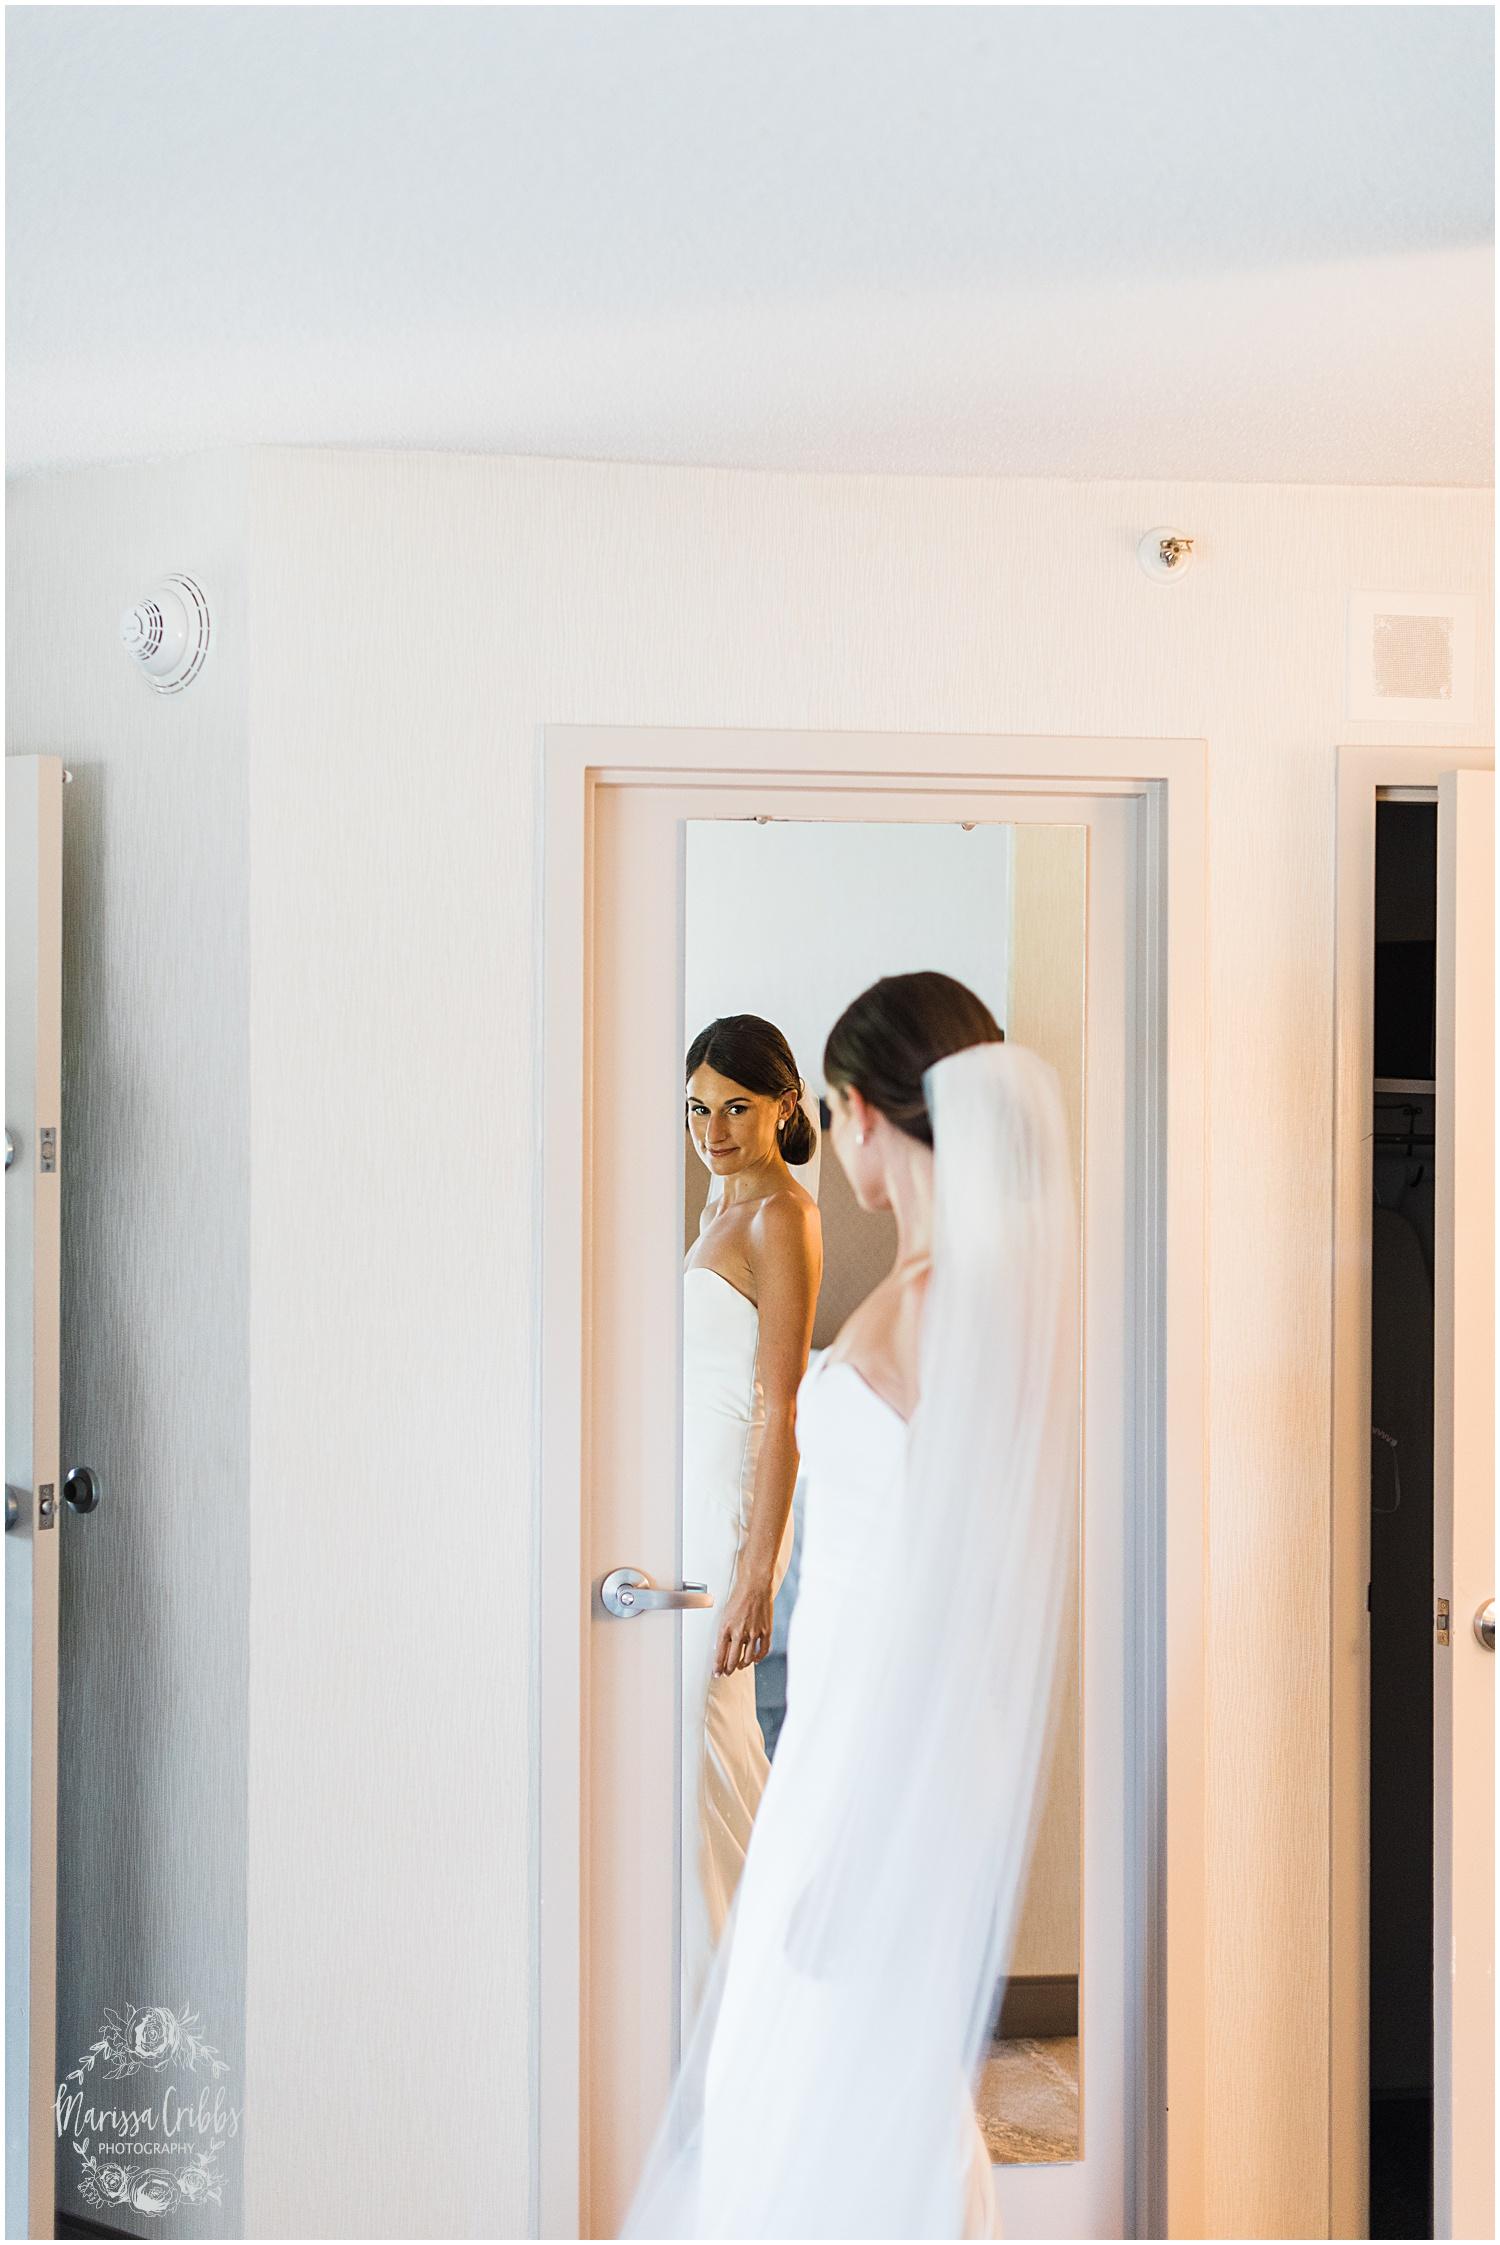 JOANNE & GEORGE MARRIED BLOG | MARISSA CRIBBS PHOTOGRAPHY | THE ABBOTT | KANSAS CITY WEDDING PHOTOS_9009.jpg